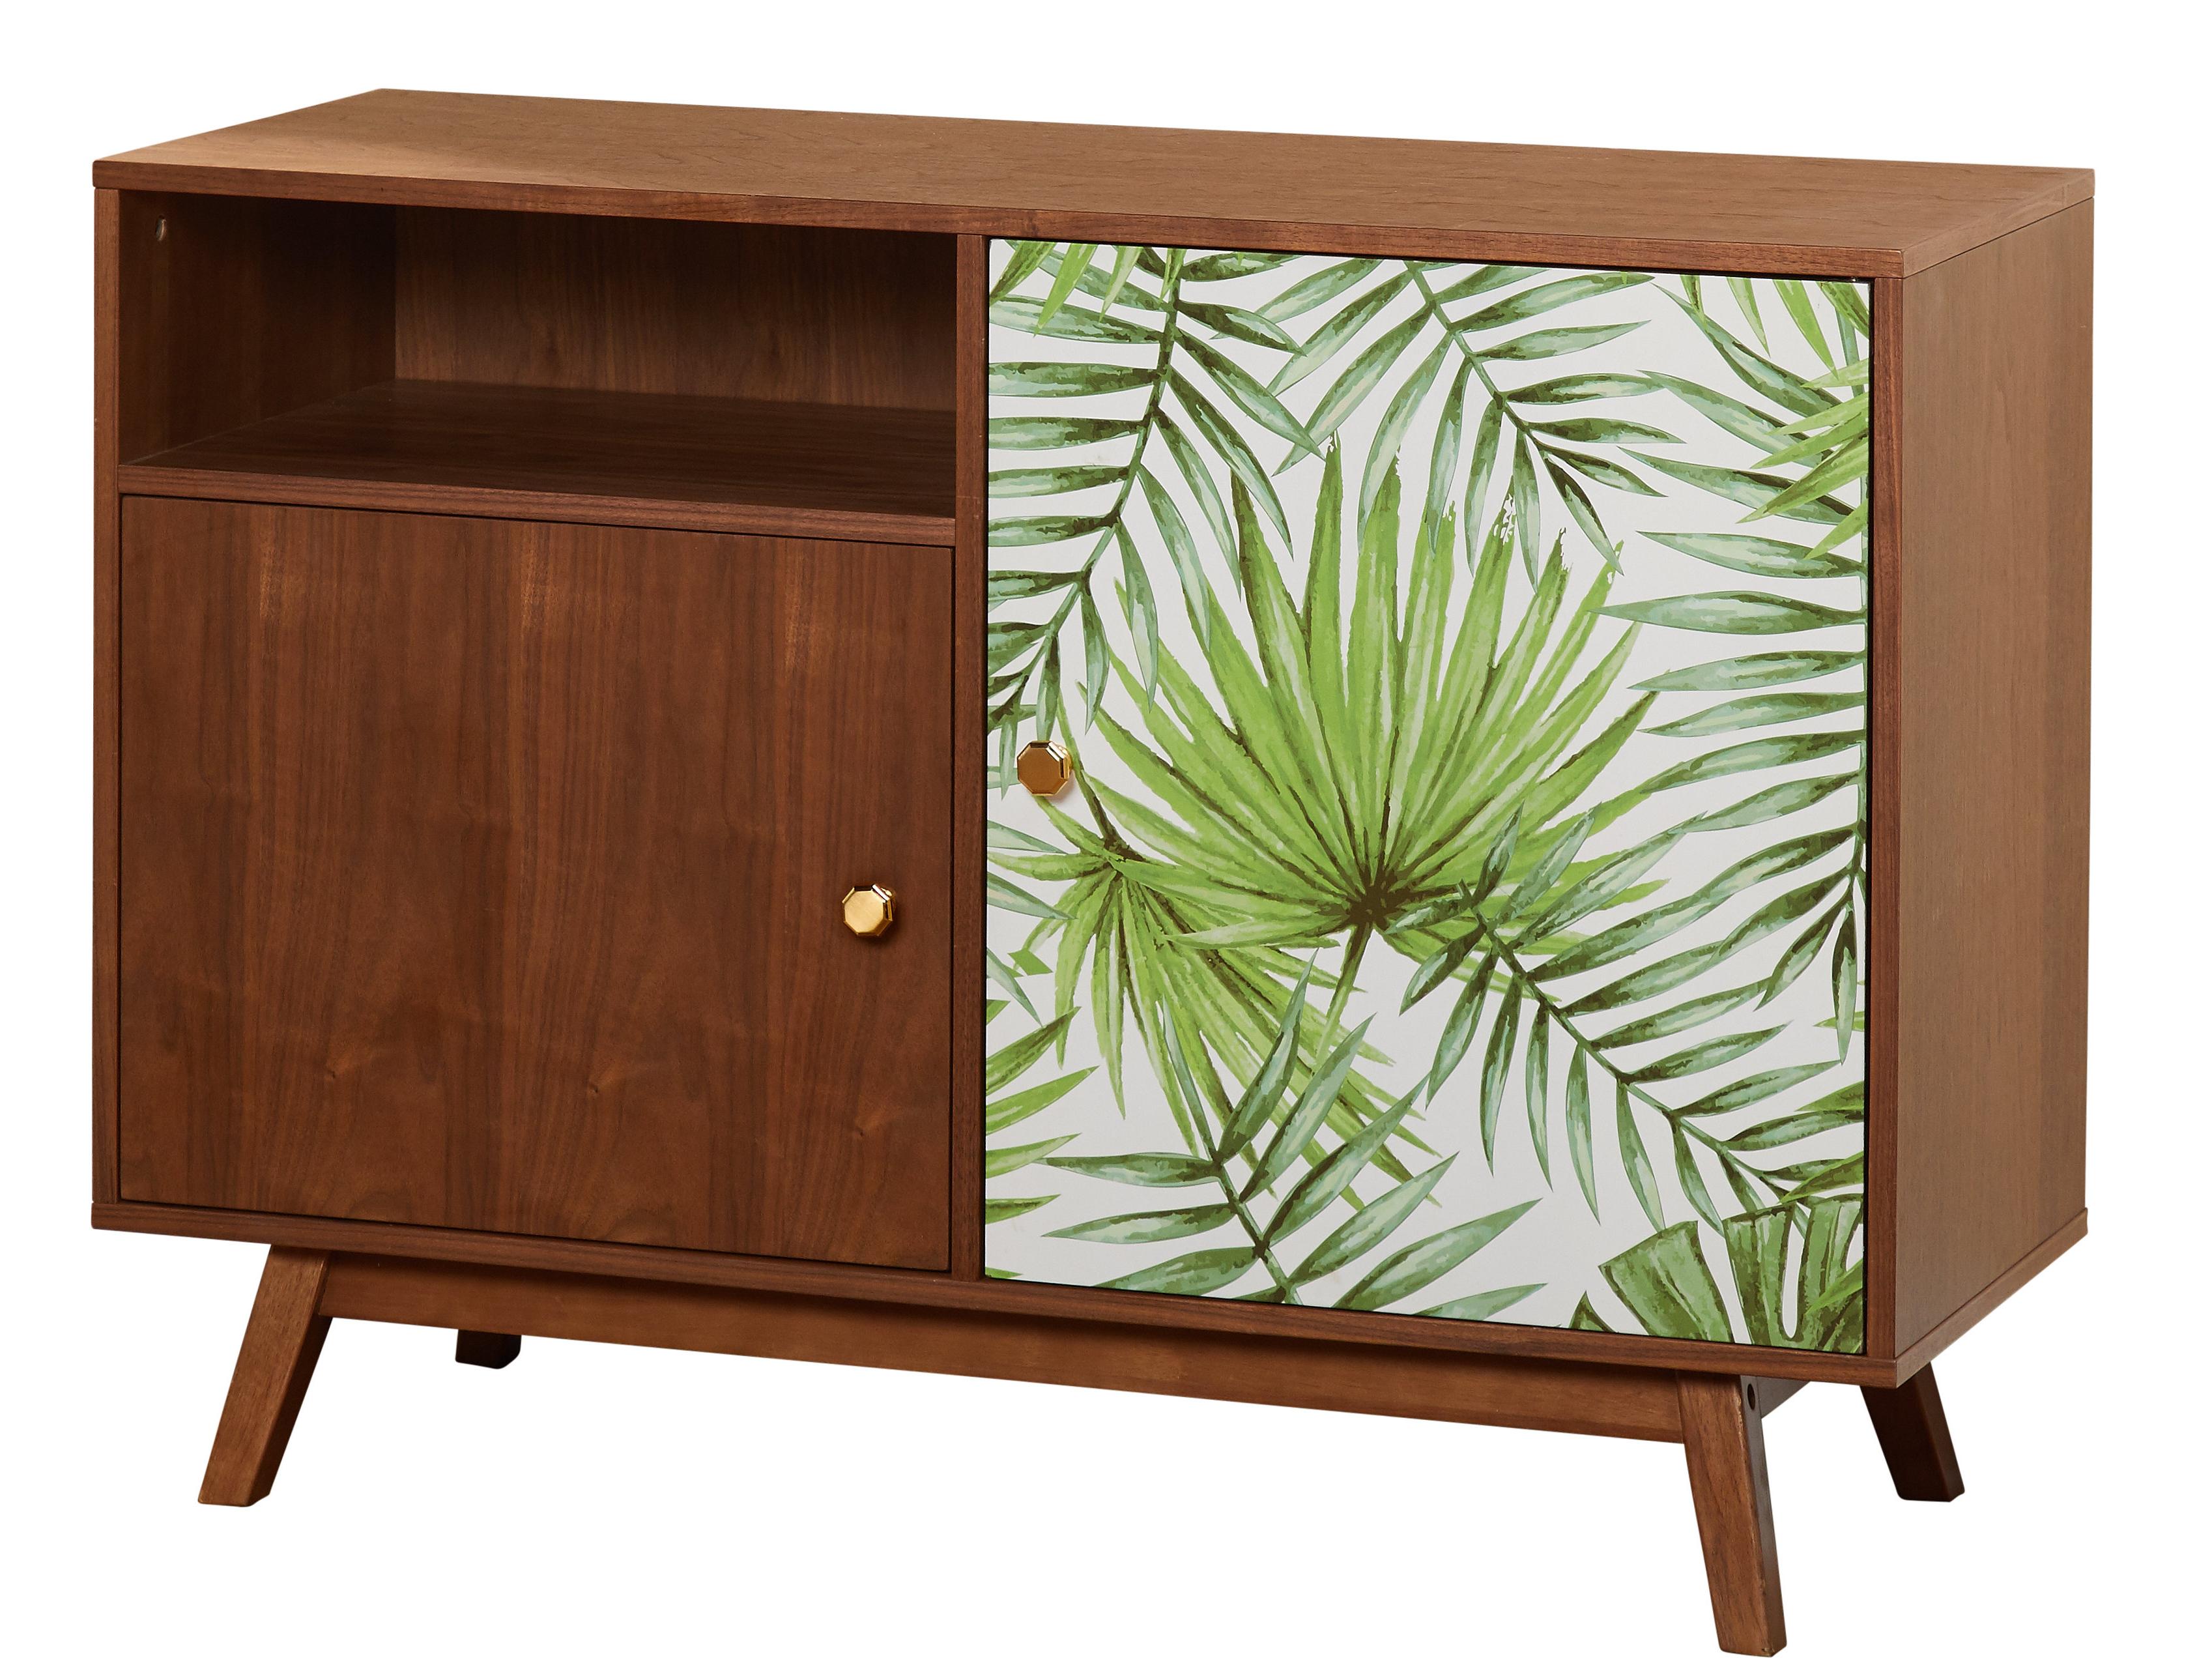 Allmodern Intended For 2019 Armelle Sideboards (Gallery 9 of 20)